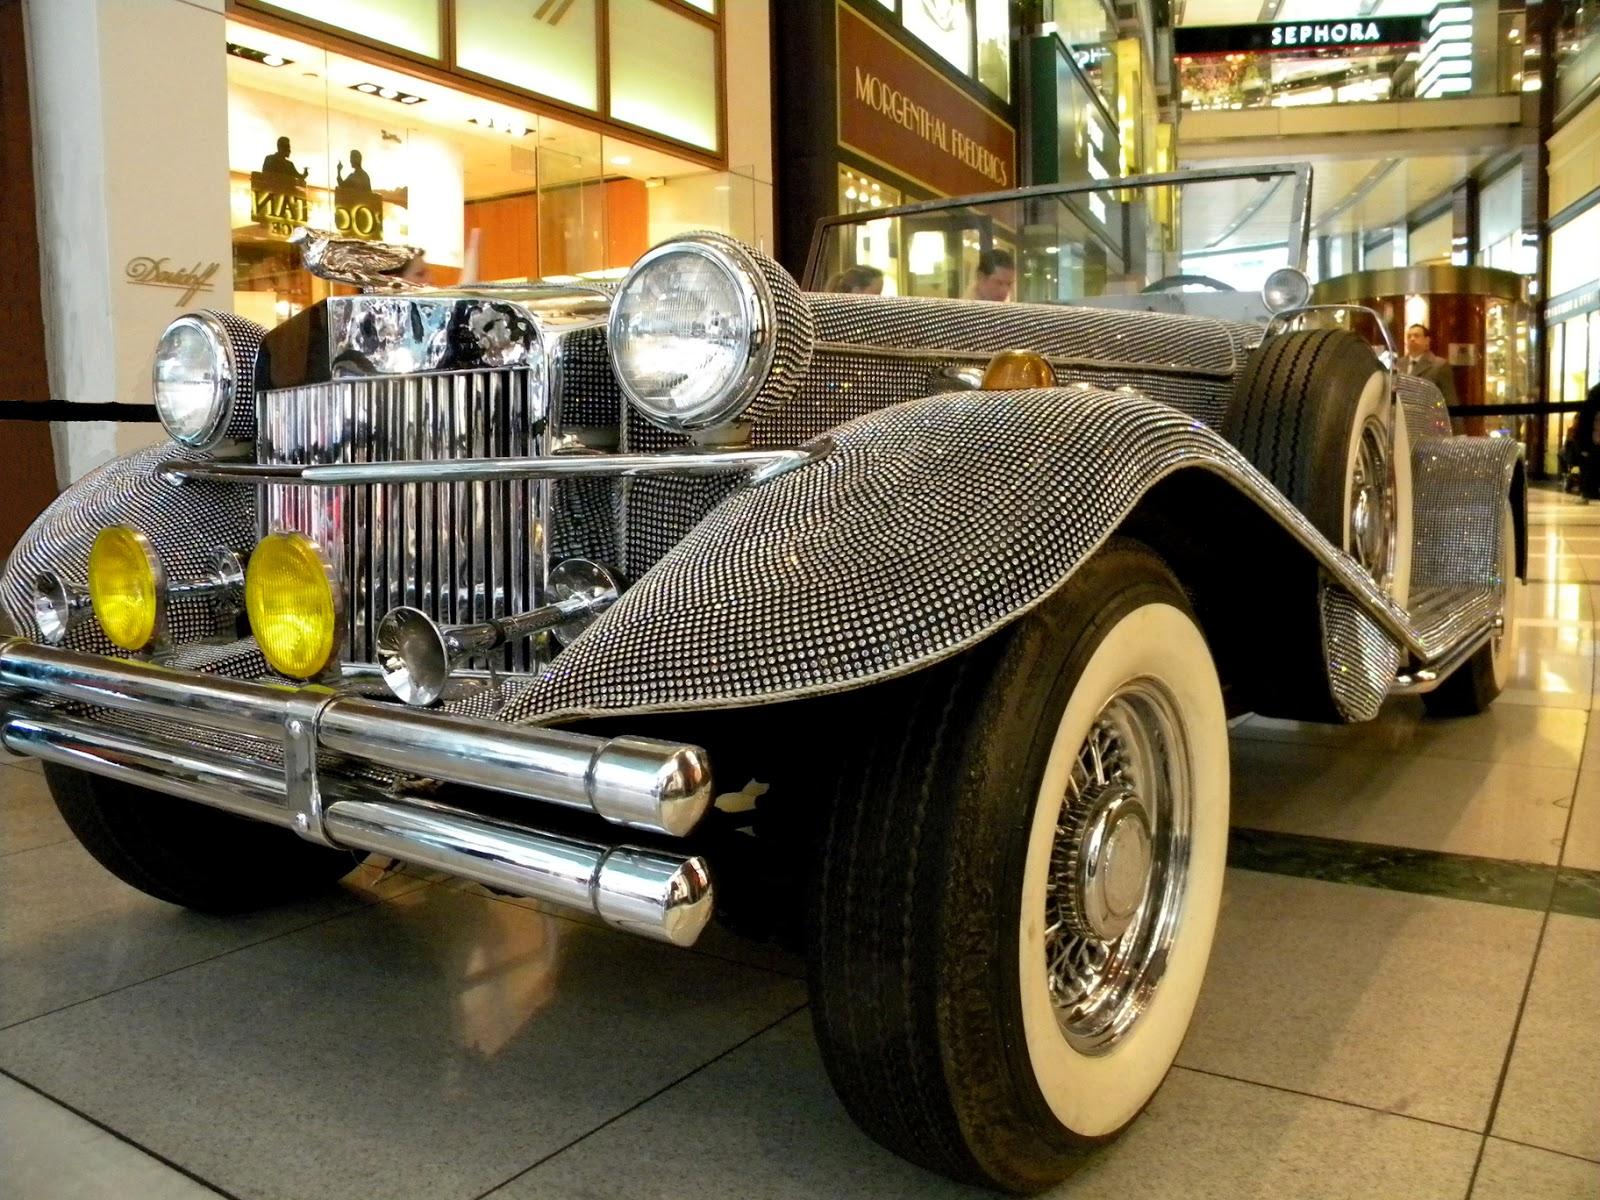 Liberace's Rhinestone Roadster